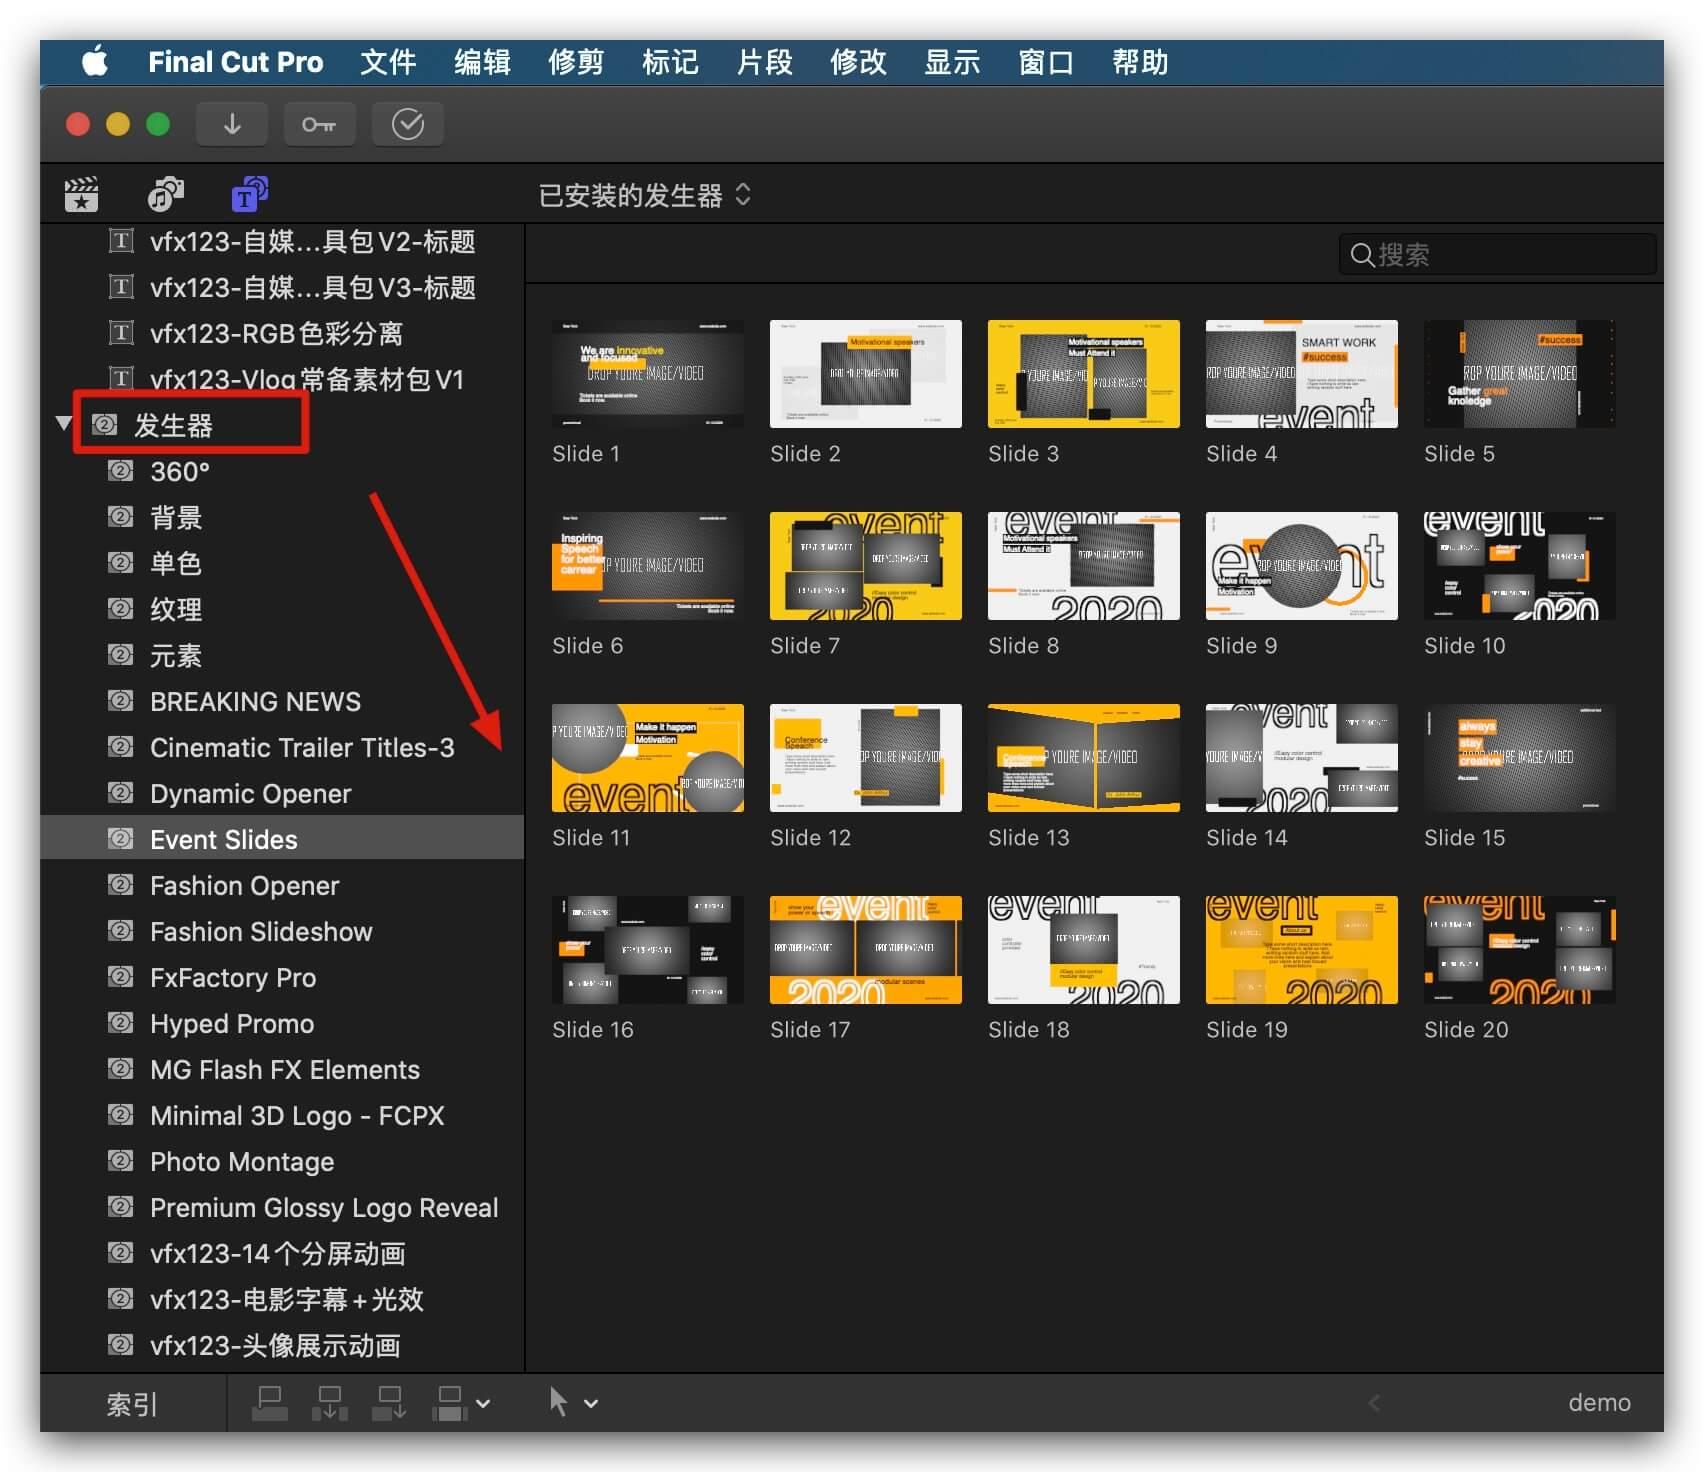 fcpx插件 20个新闻事件公司图文展示分镜模板 Event Slides